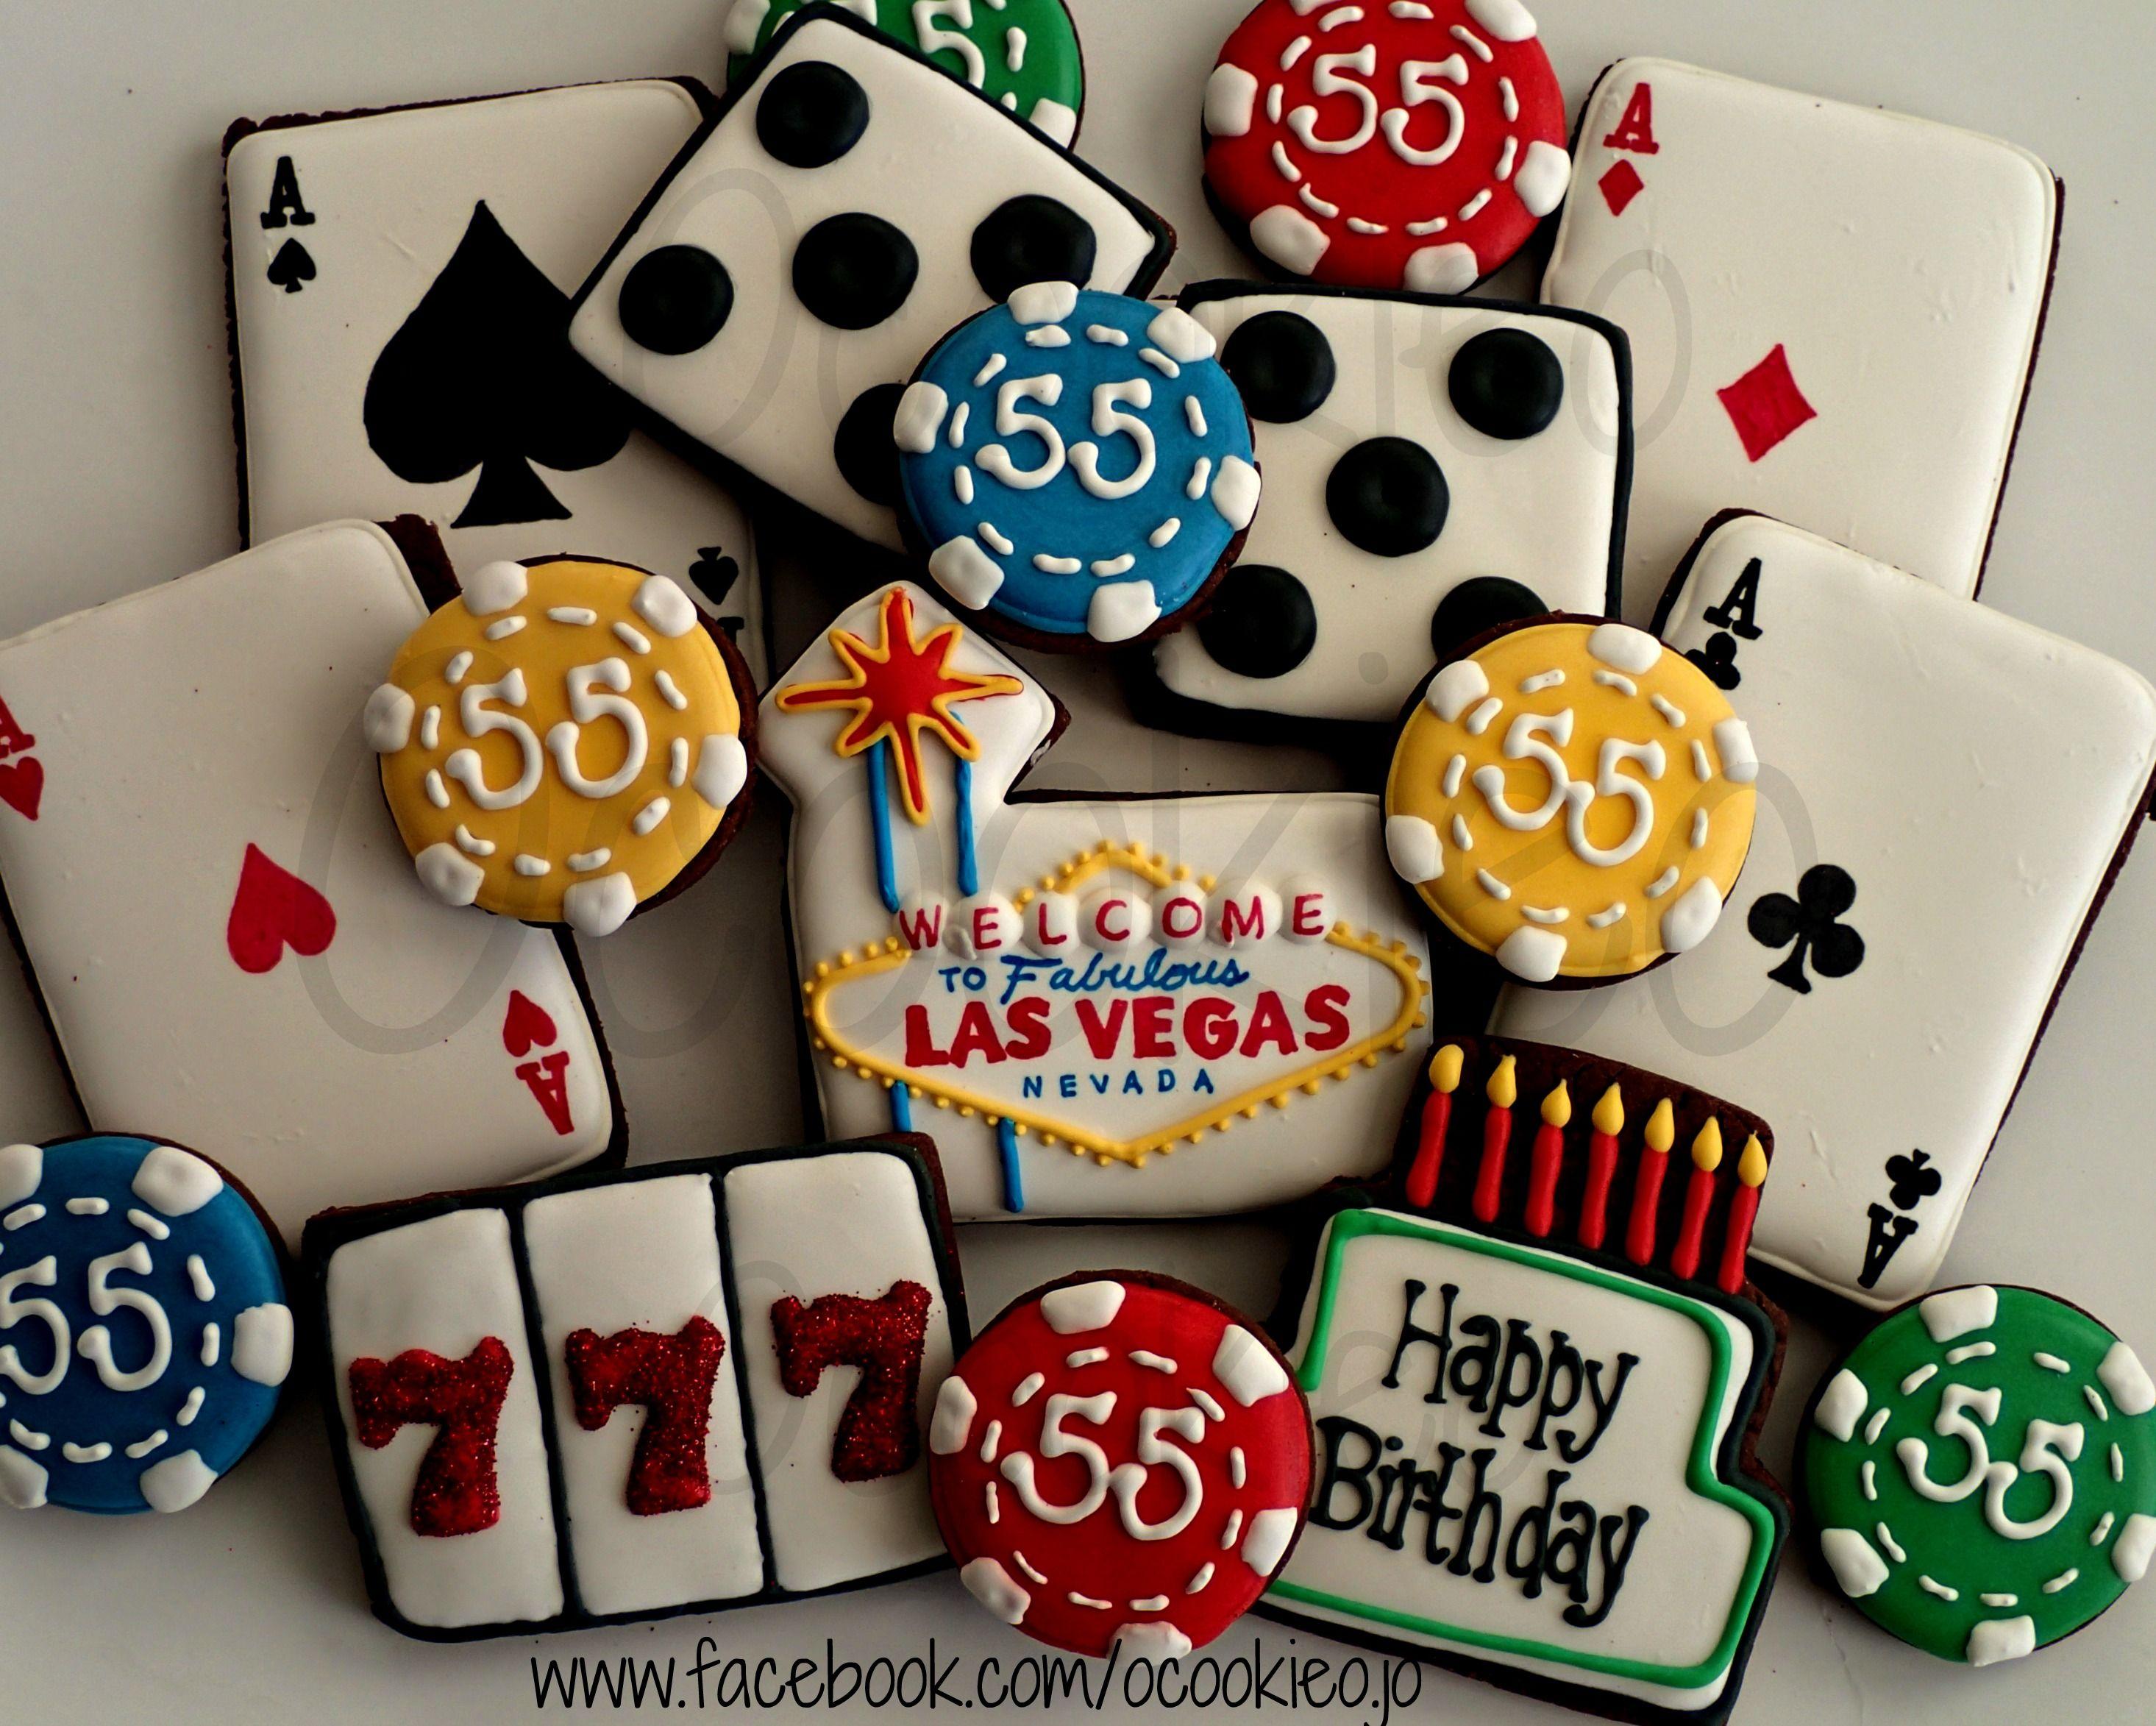 Cookie decorating party ideas - Las Vegas Themed Birthday Cookies By Ocookieo Www Facebook Com Ocookieo